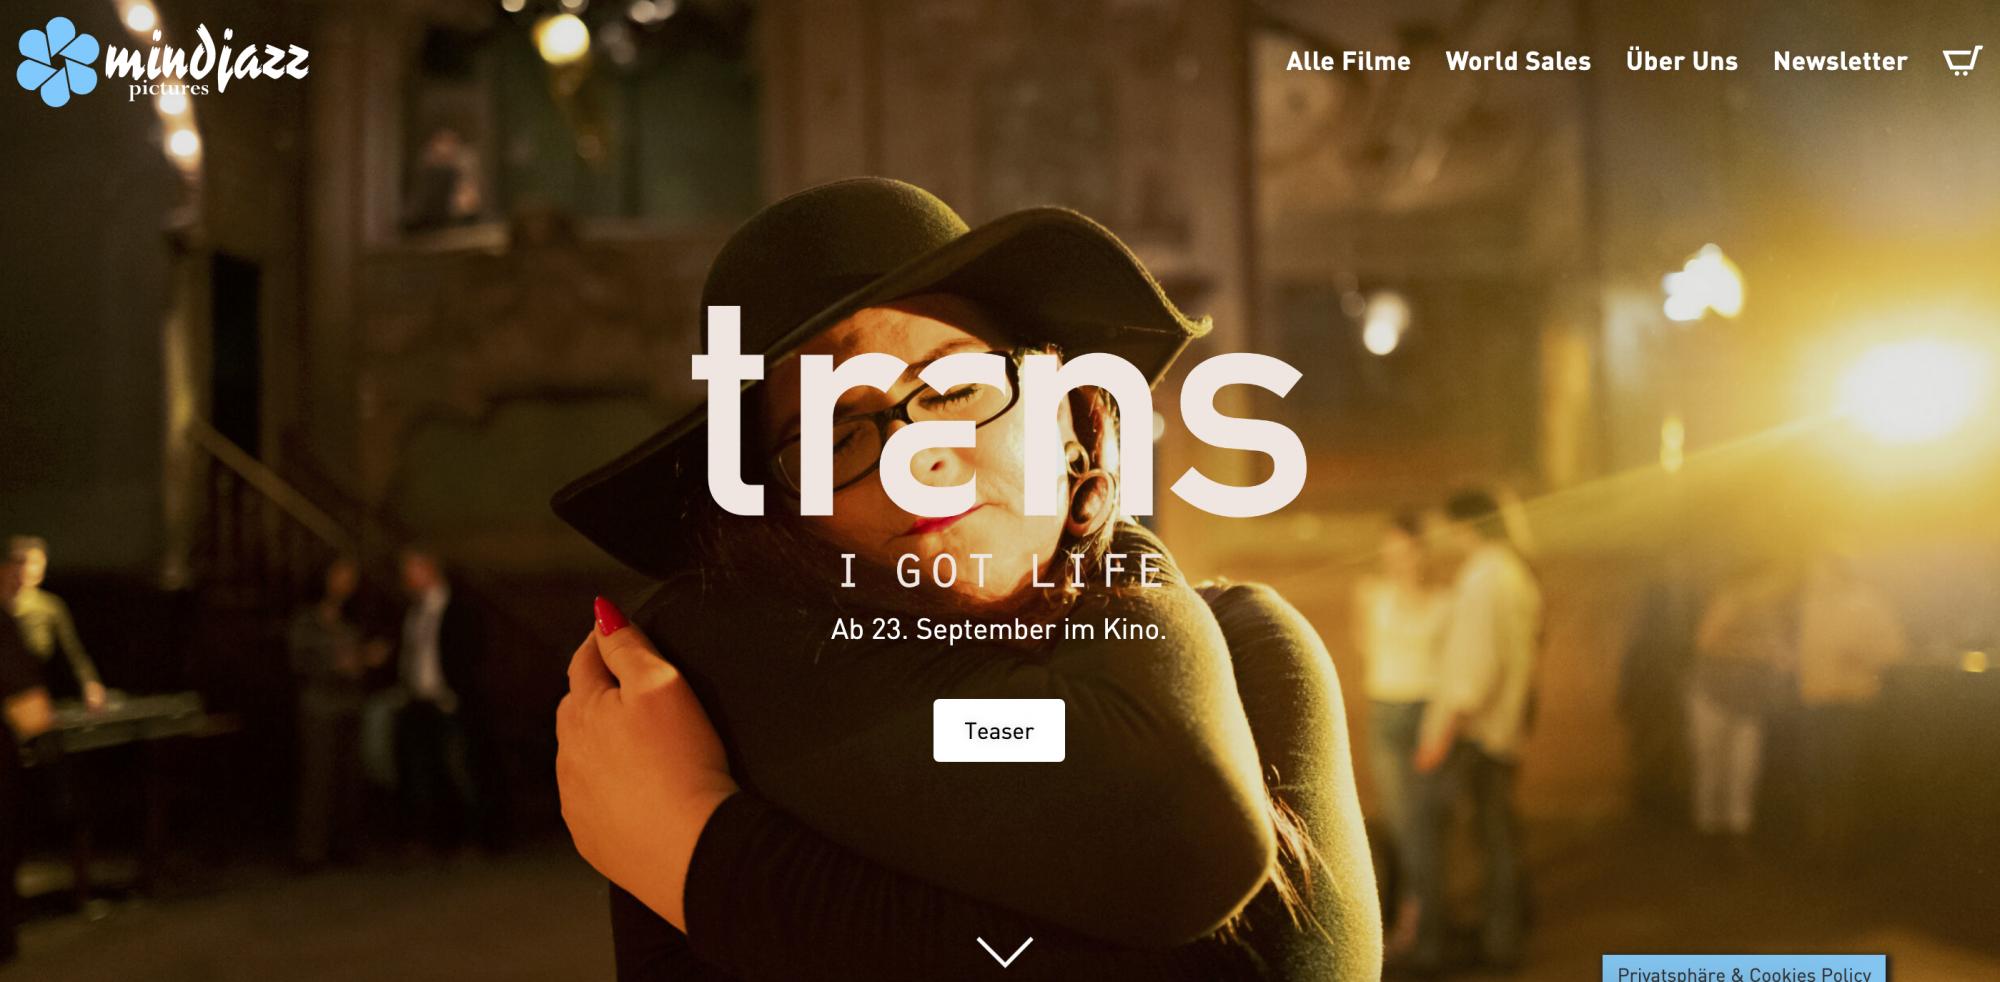 TRANS - I GOT LIFE_antjekroeger